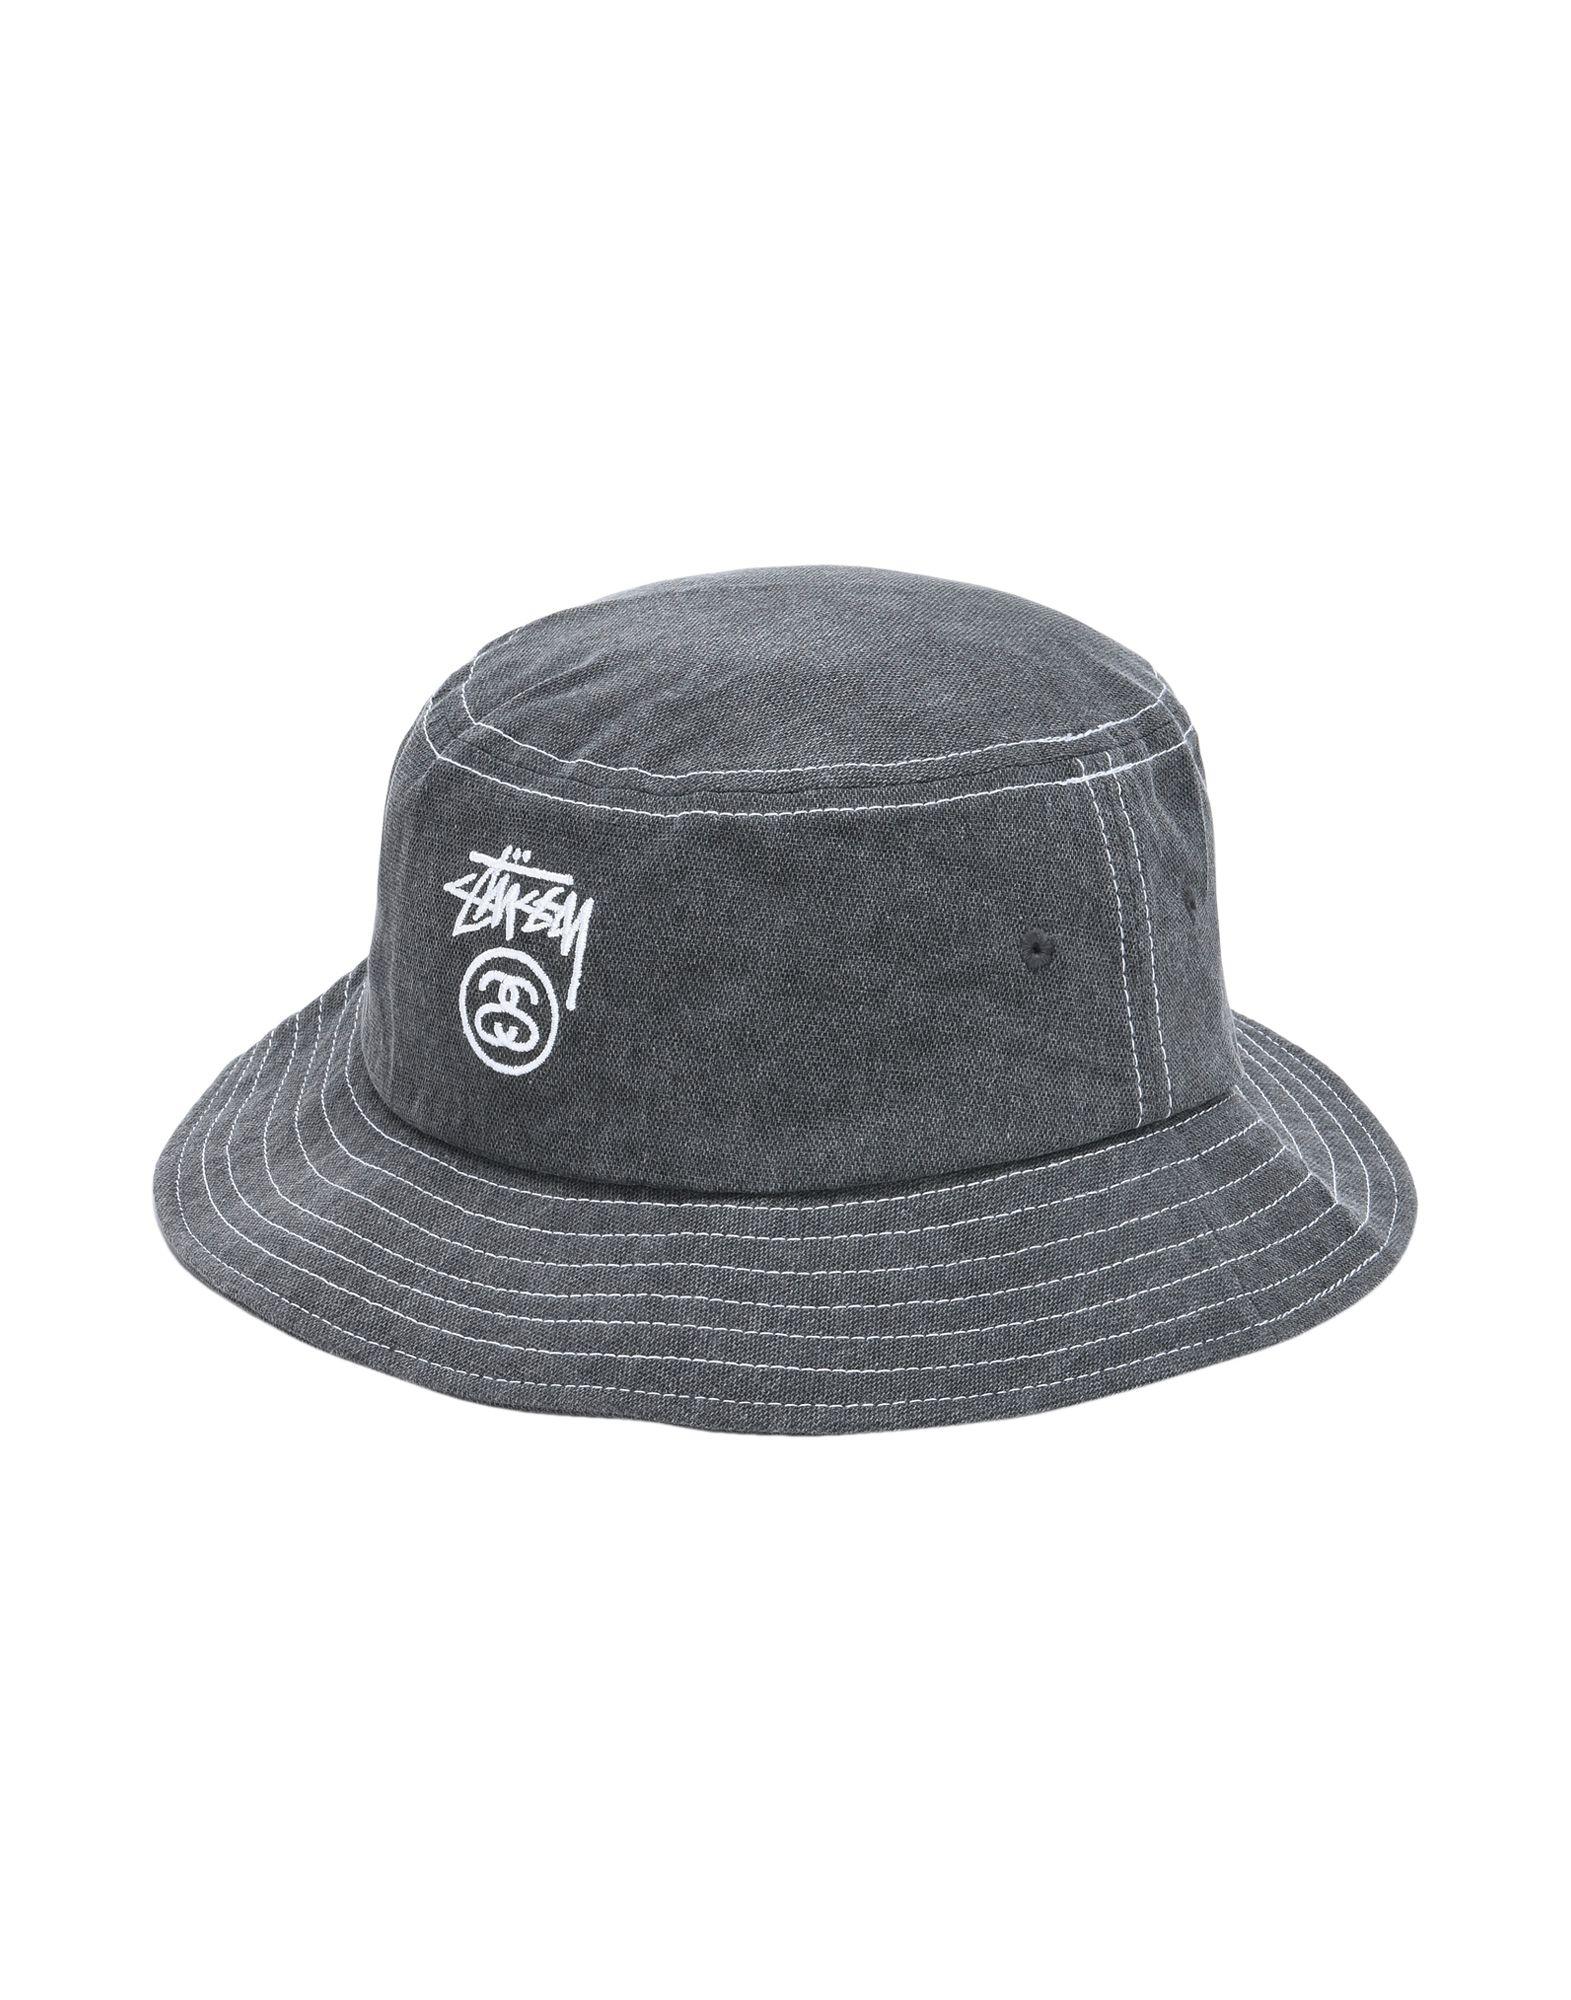 stussy bucket hat price - HD1571×2000